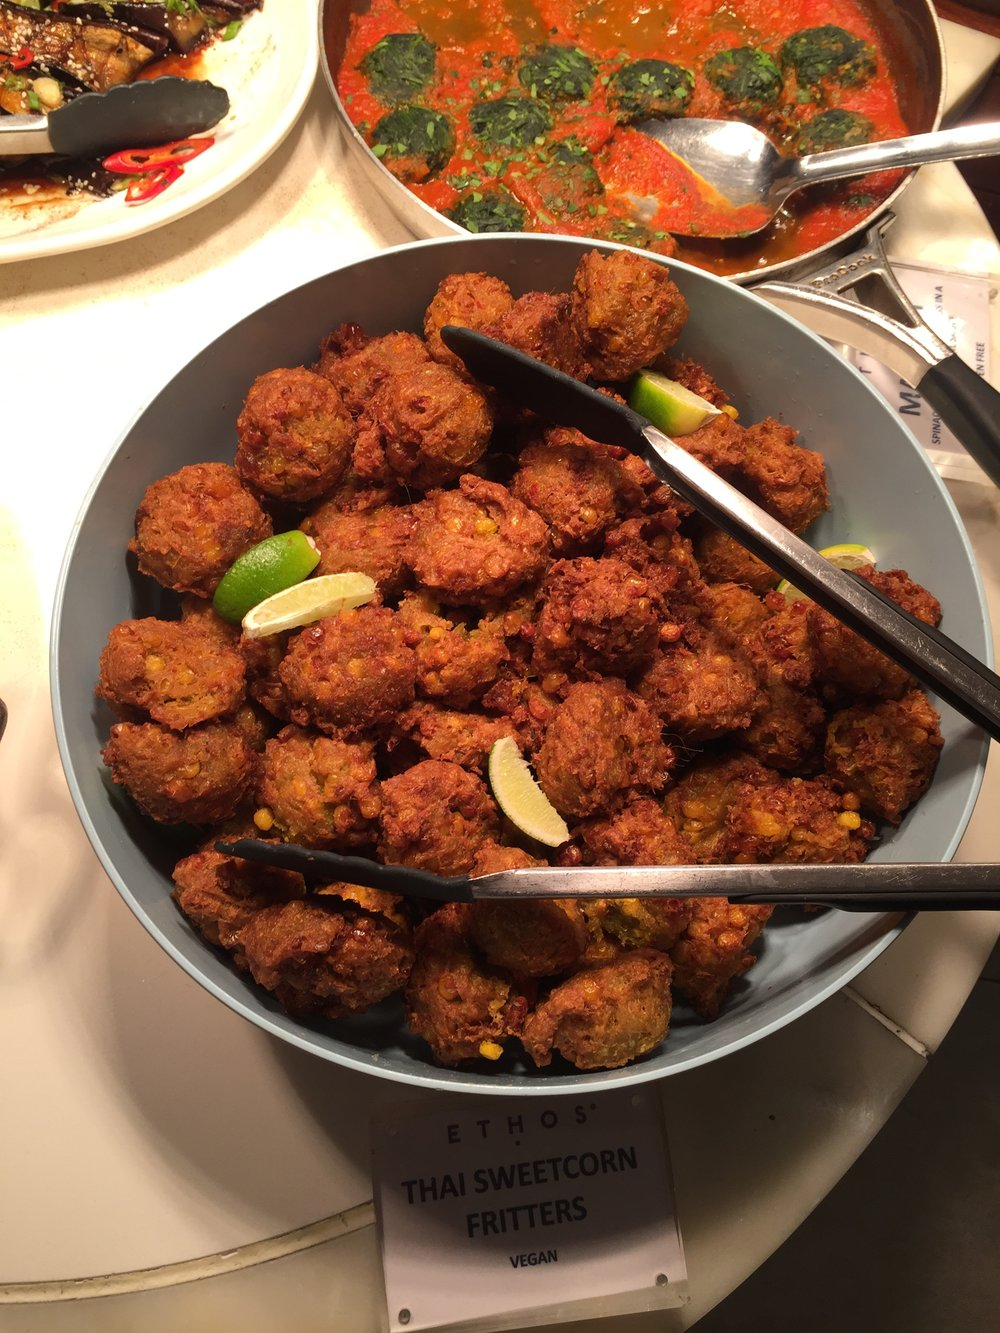 Ethos restaurant review - buffet